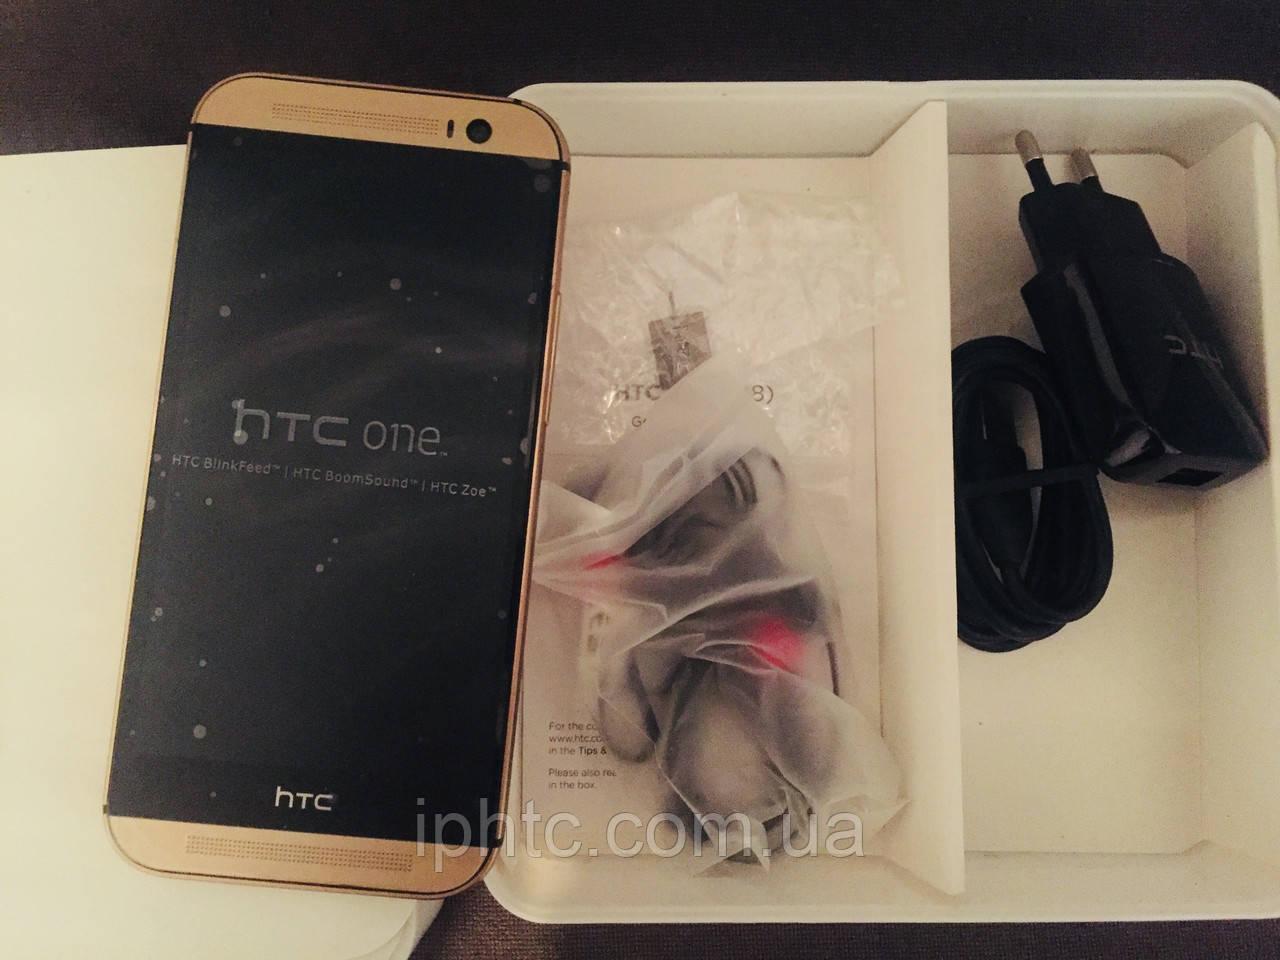 HTC One M8 16GB Gold.4G EU. Новый. В наличии., фото 1